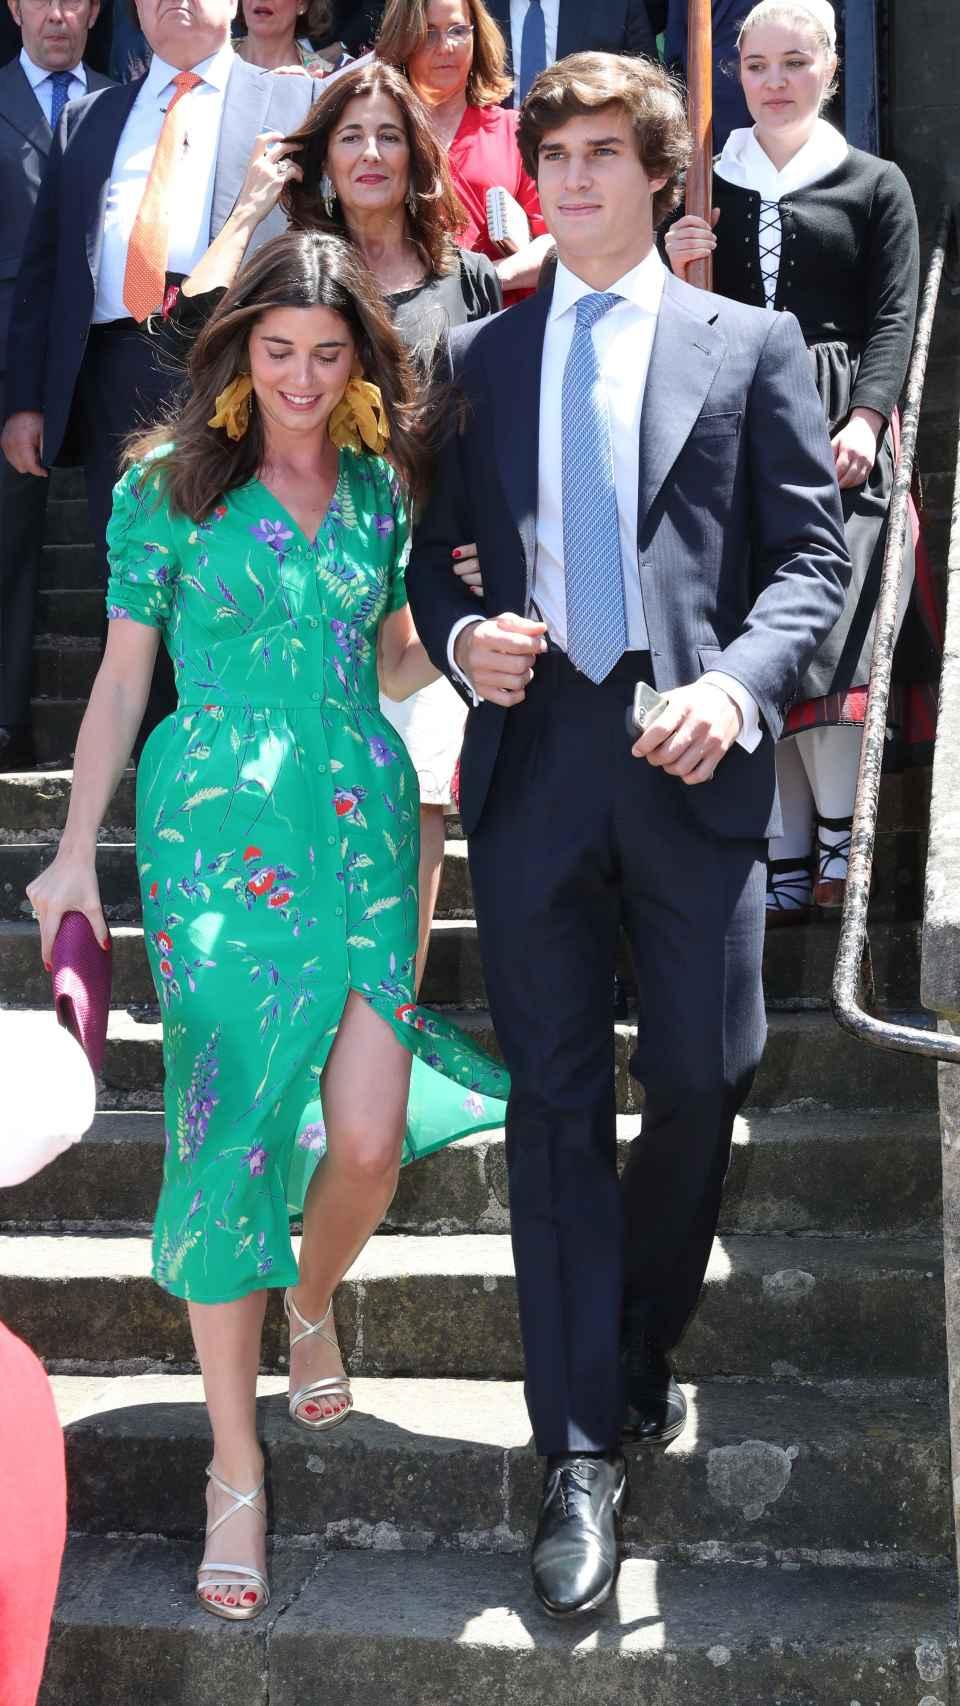 Carlos Fitz-James Stuart y Belén Corsini durante la boda de Valentina Suárez Zuloaga.